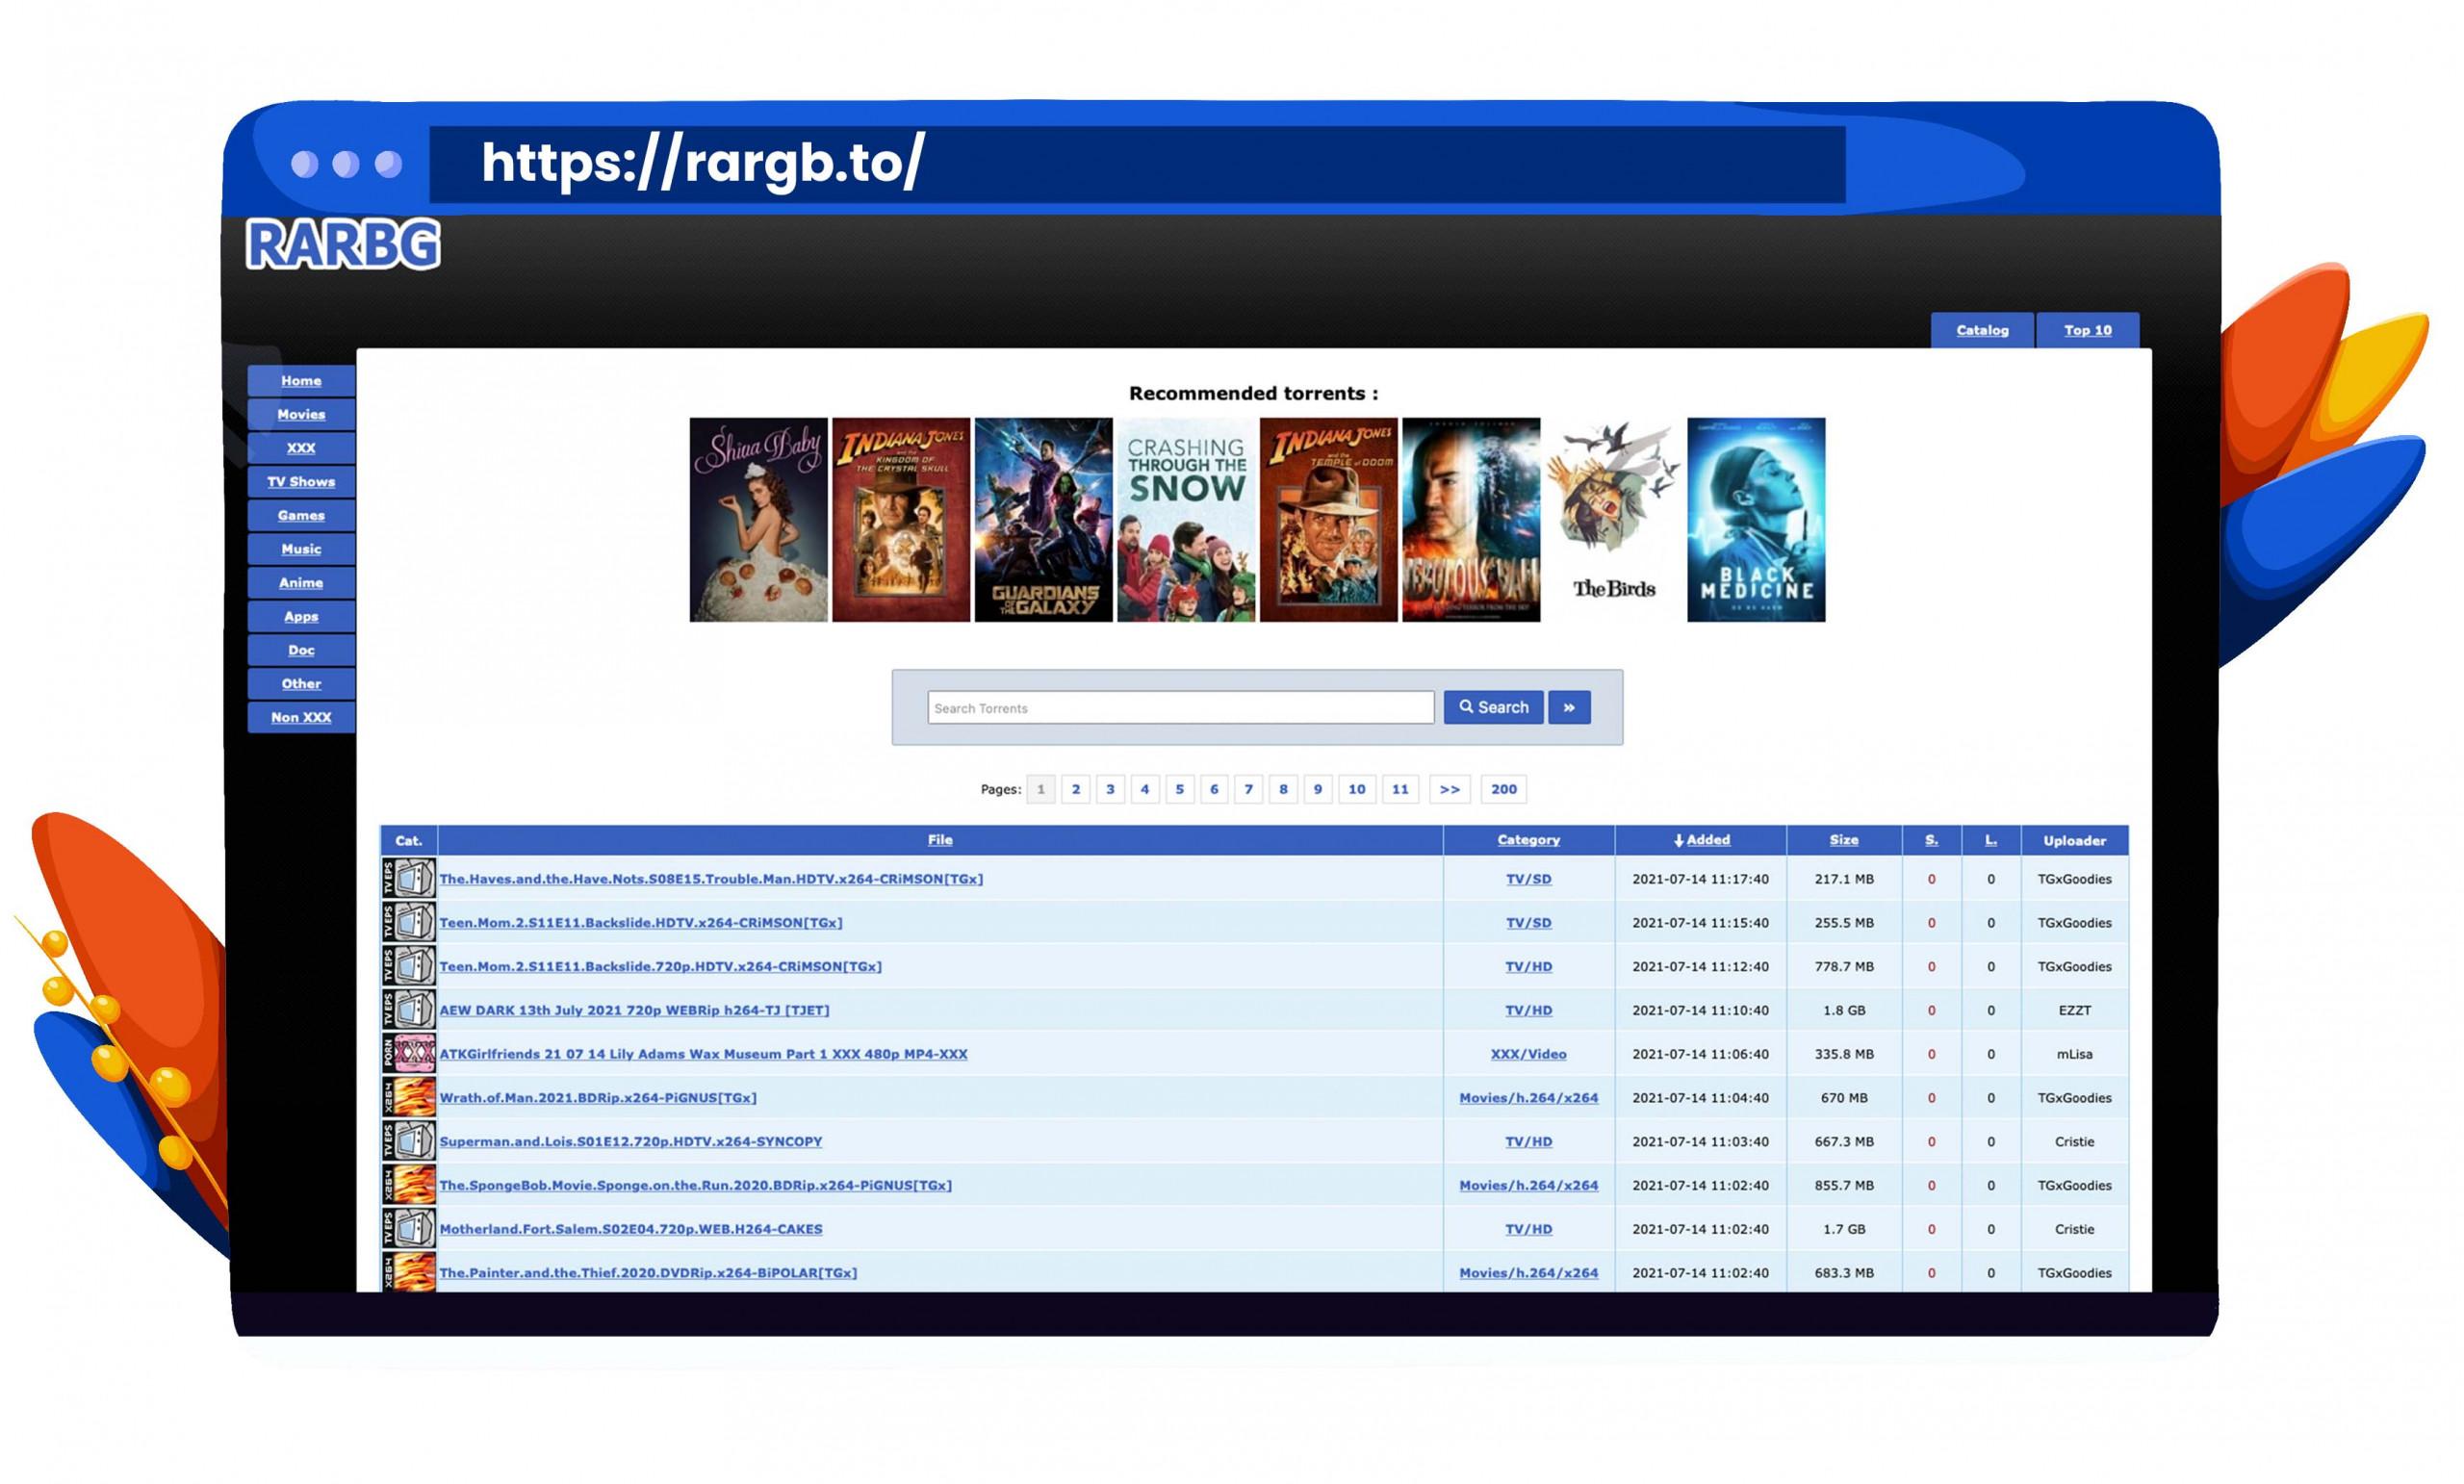 RARBG torrenting movies, shows and software